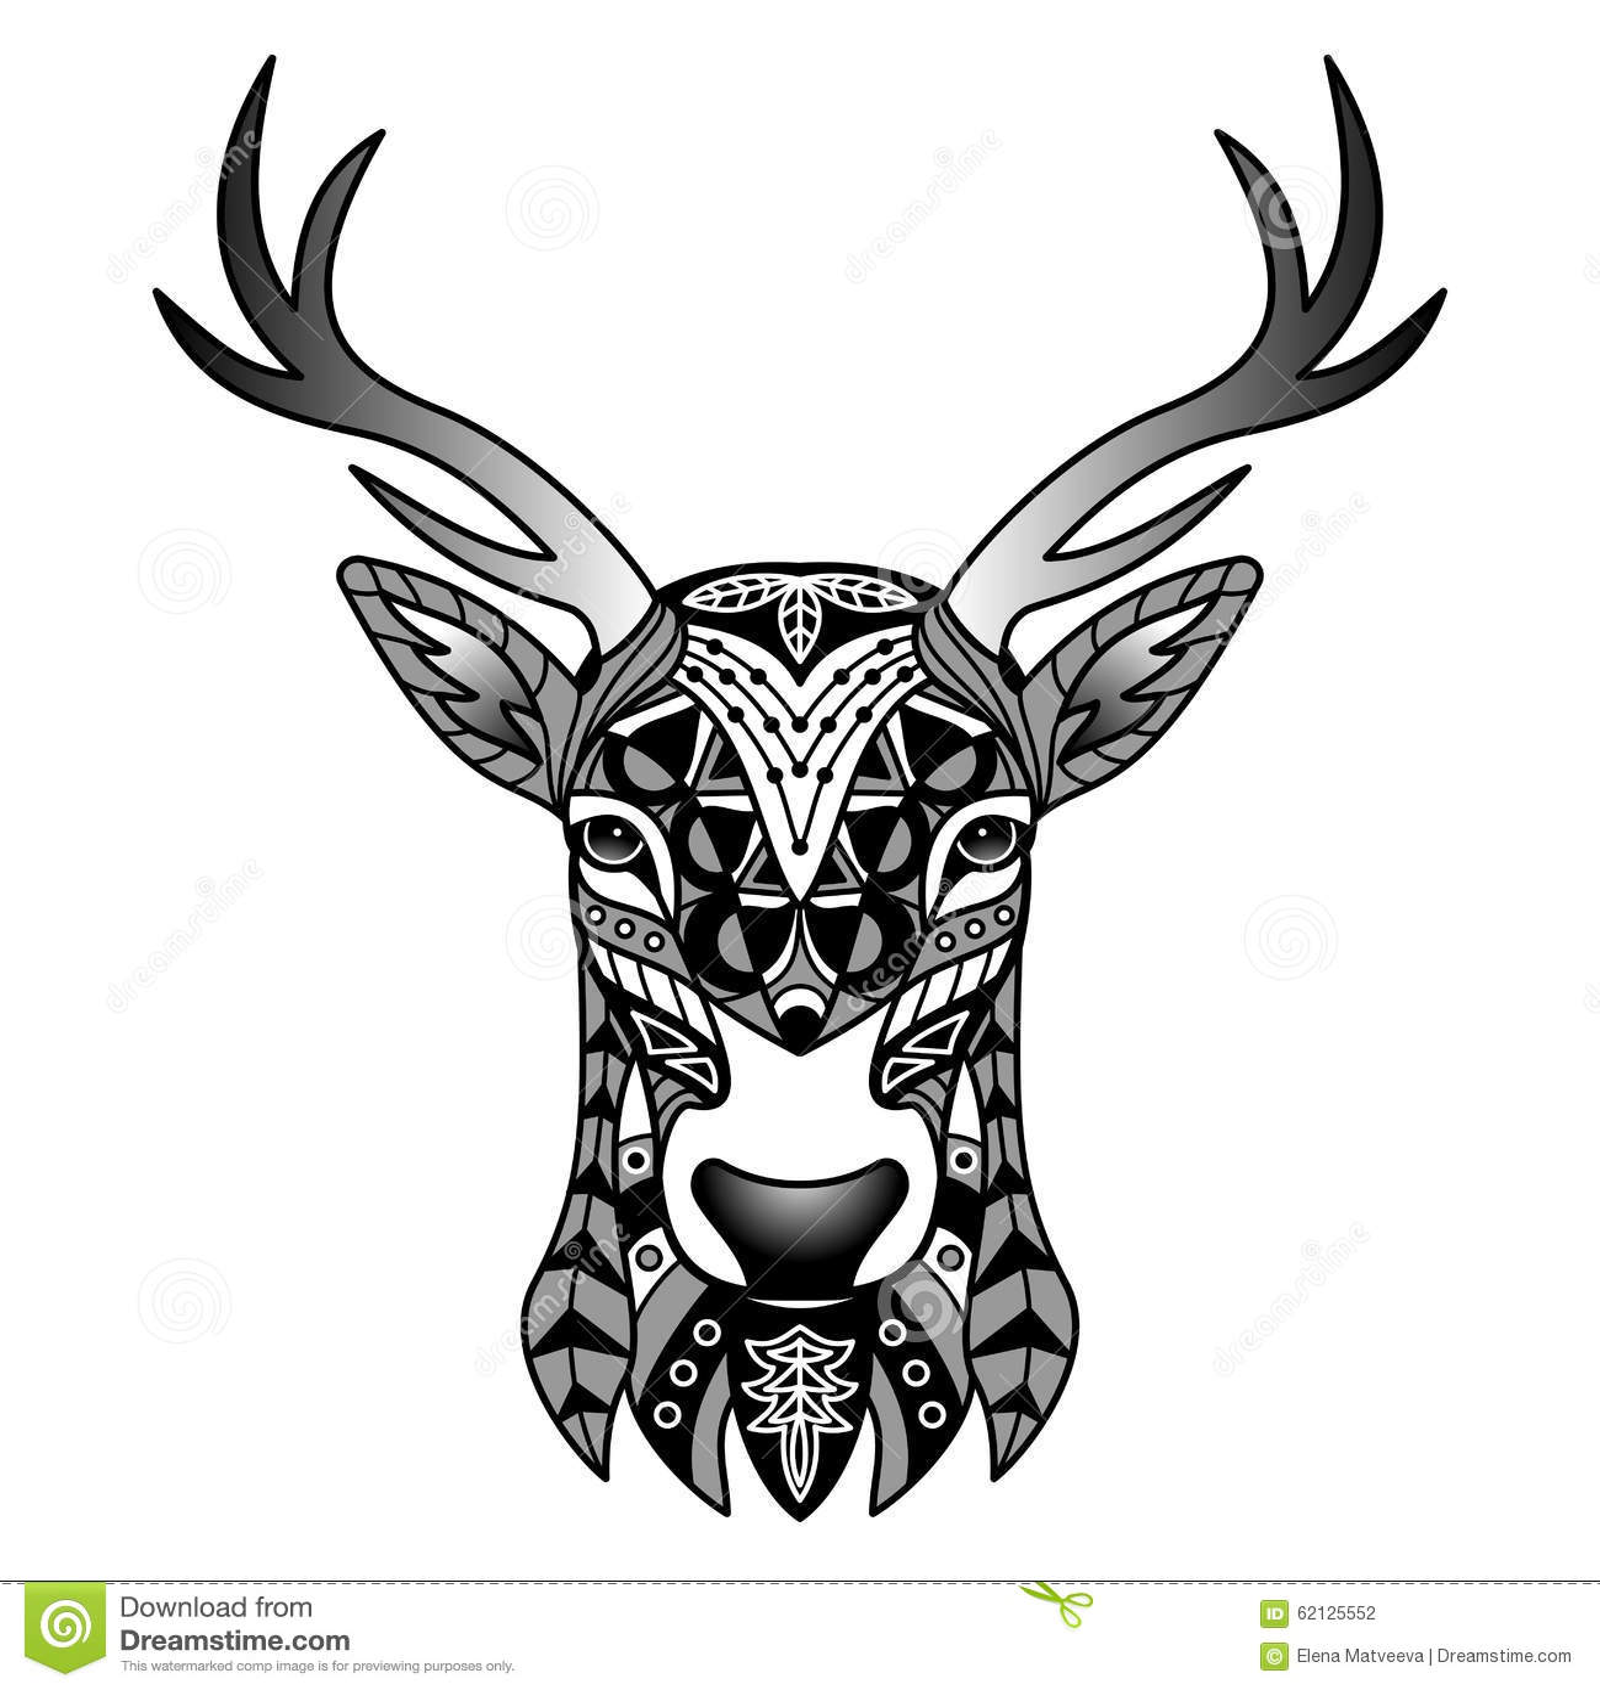 Fantasy Black Deer Mascot Stock Vector. Image Of Child